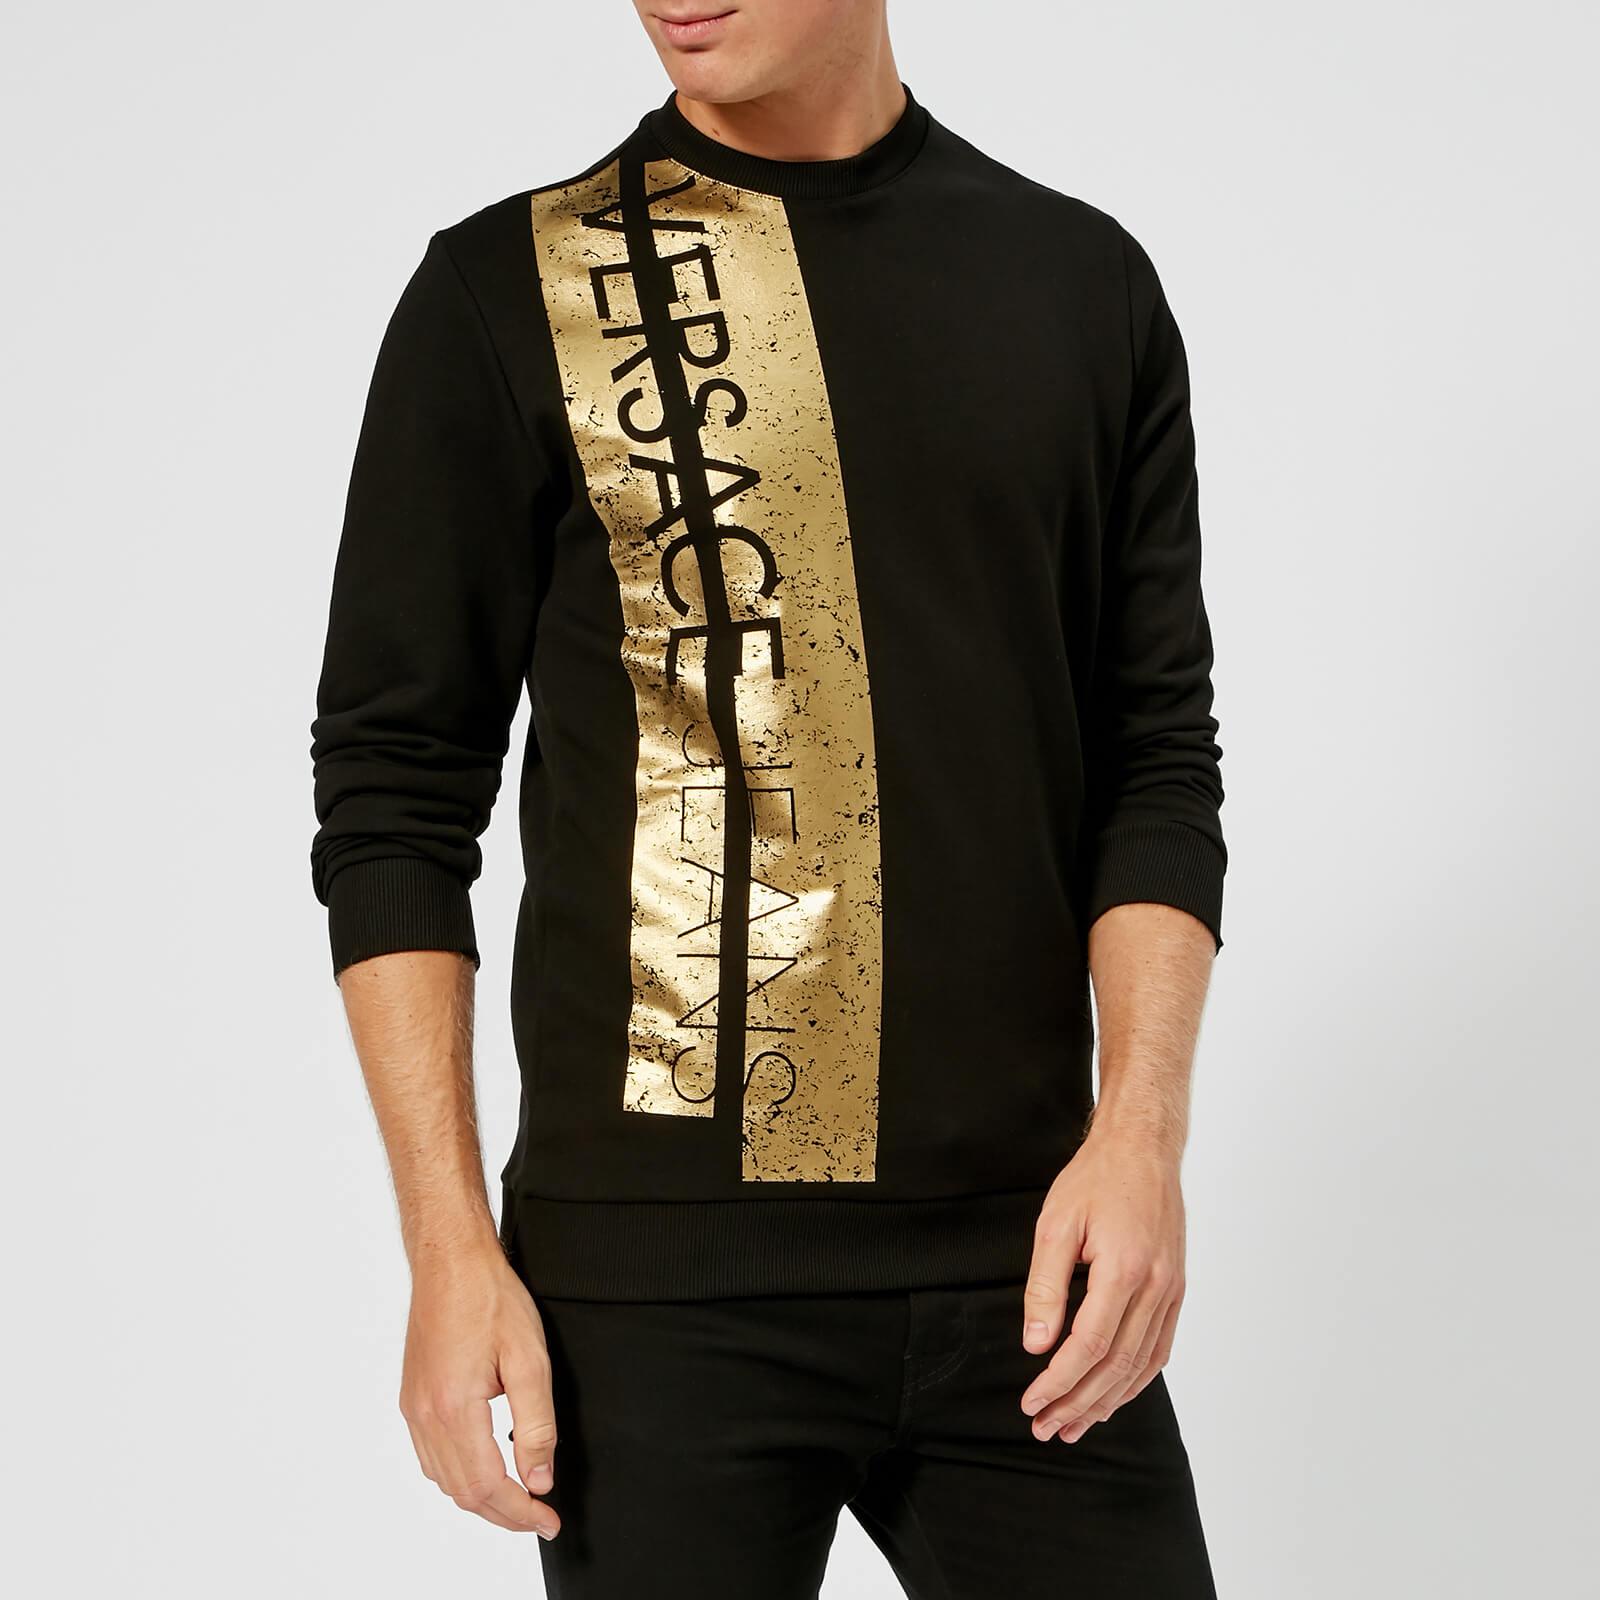 2e09acaaec8 Versace Jeans Men's Foil Print Sweatshirt - Nero